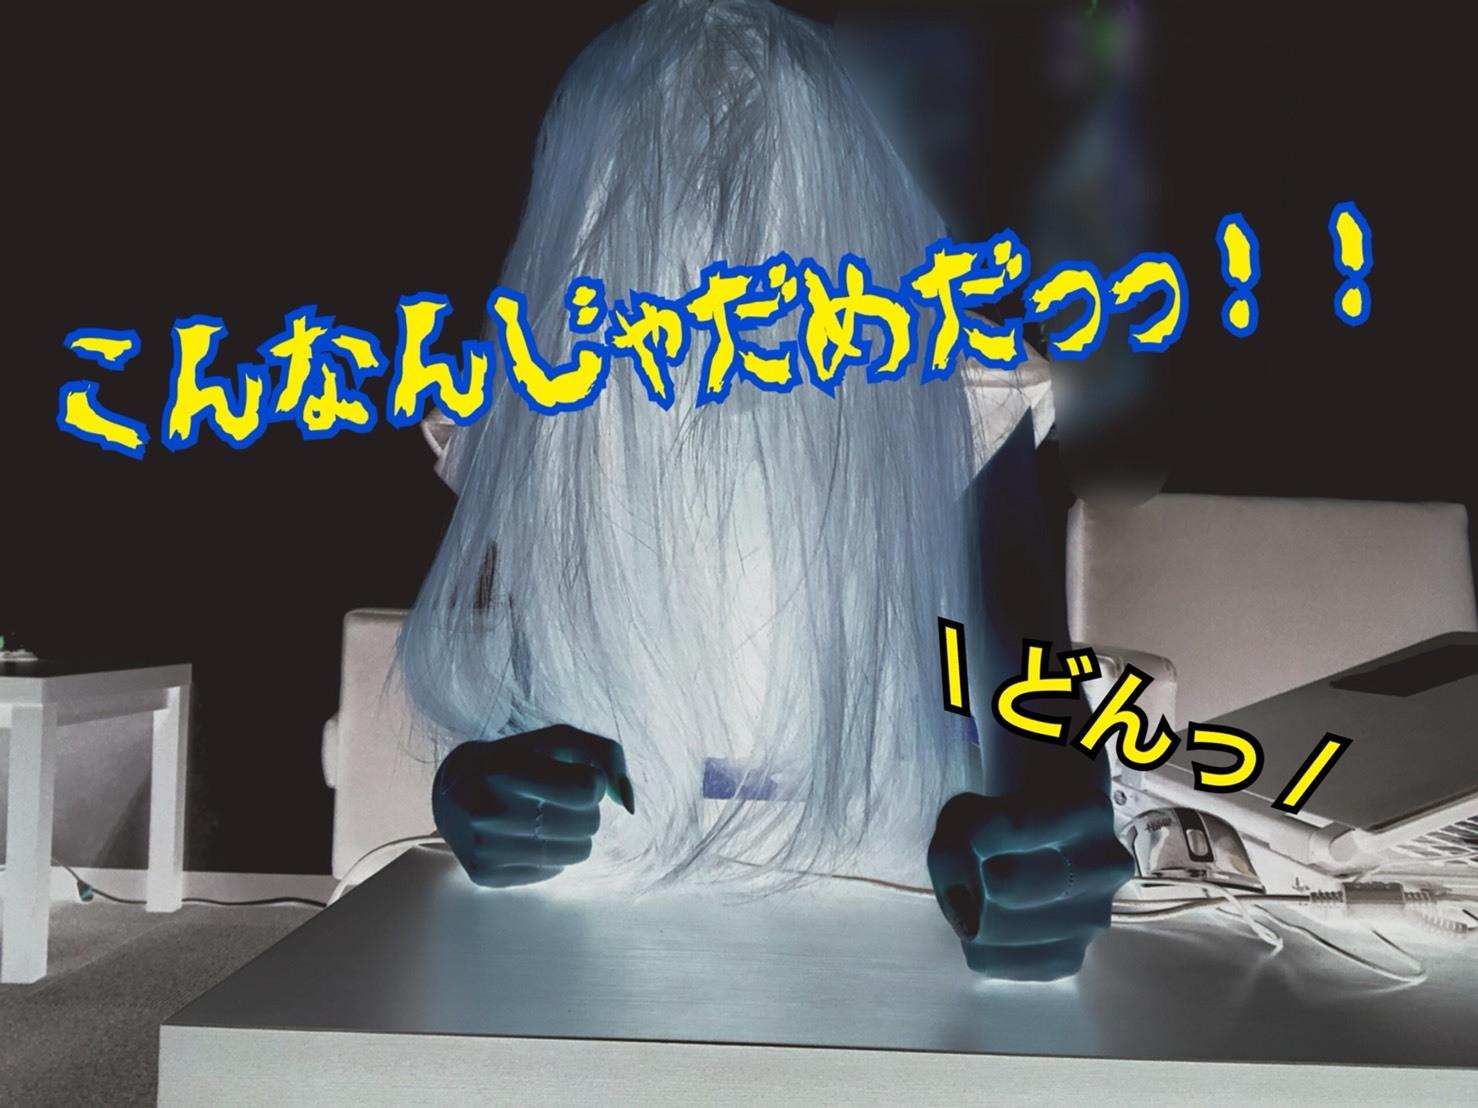 S__17563650.jpg